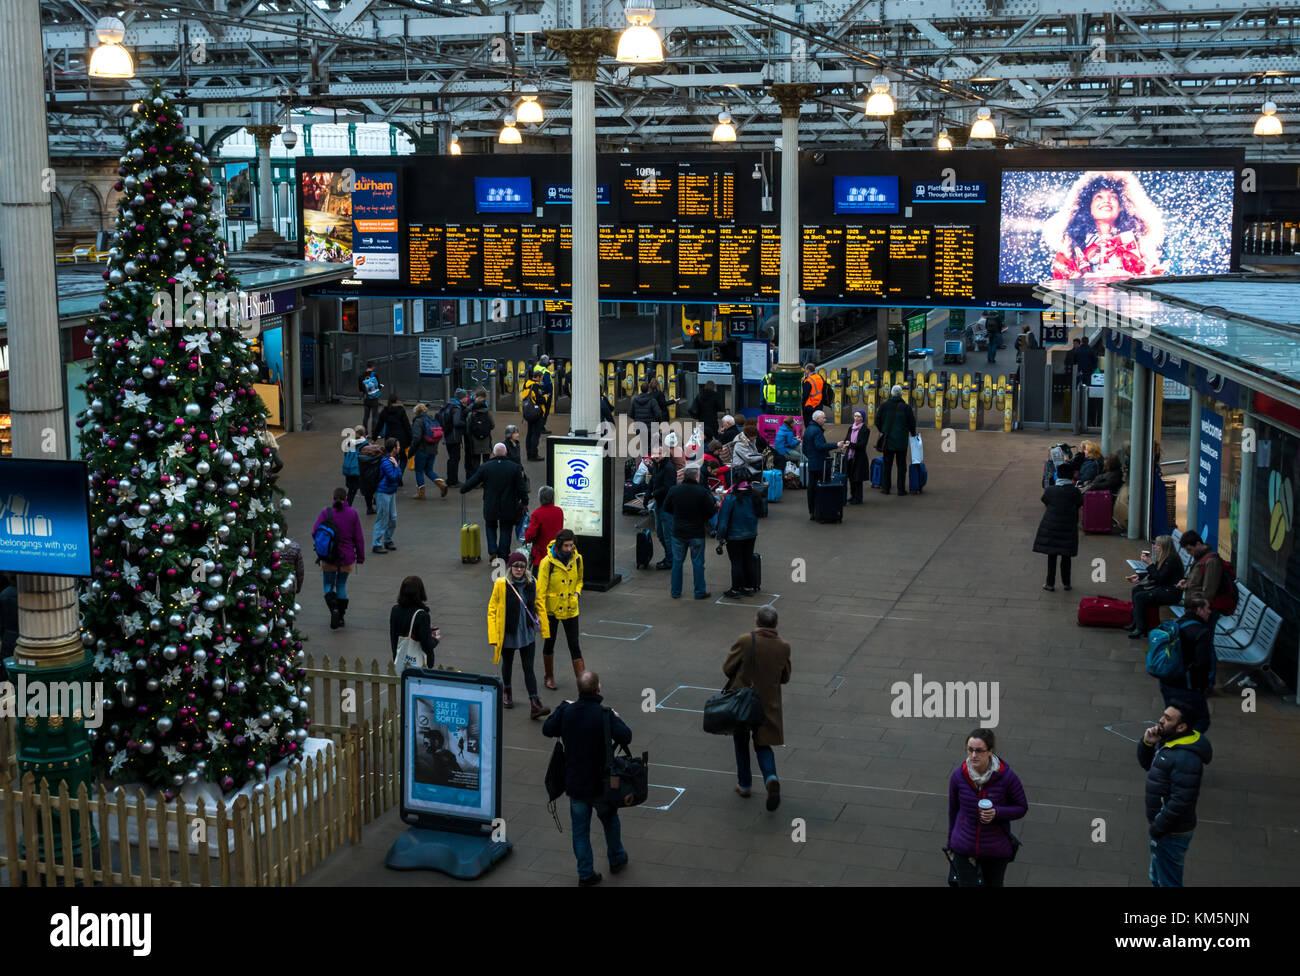 Edinburgh, Scotland, United Kingdom, 4th December 2017. Decorated Christmas tree at Waverley Station, with electronic Stock Photo